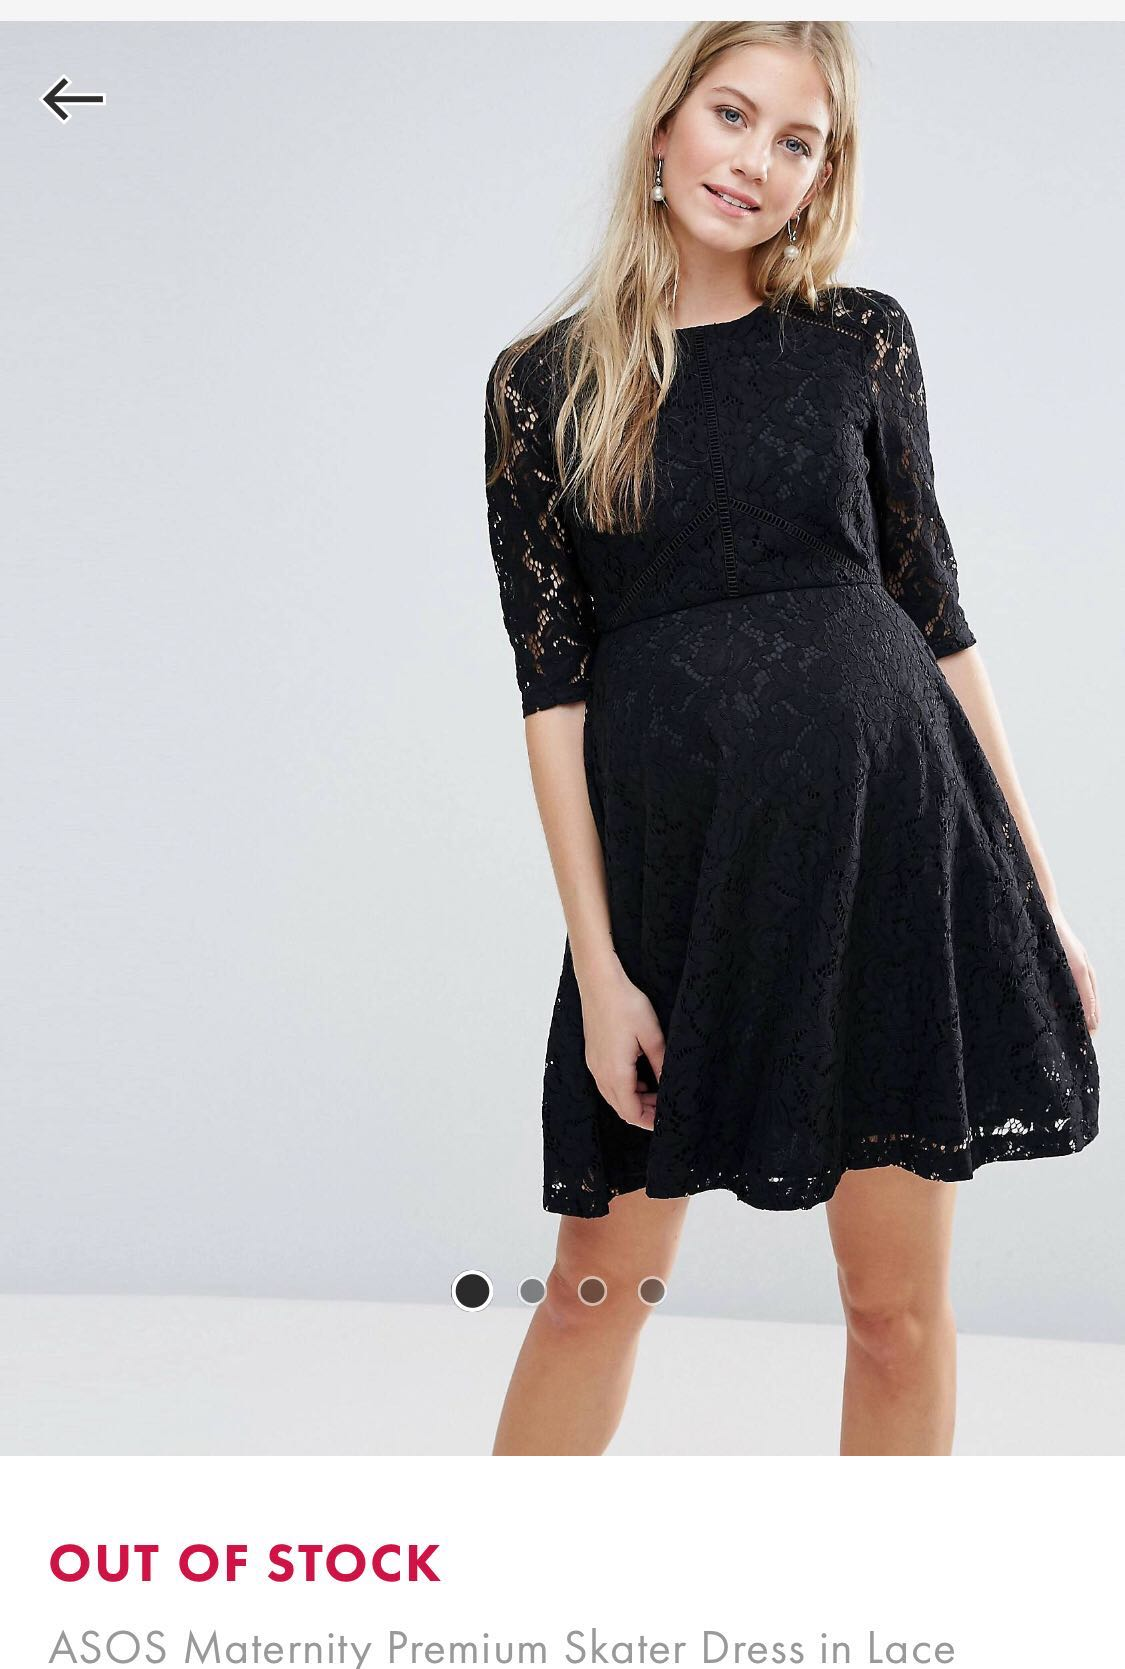 a476dd74a2373 Asos Maternity Lace Skater Dress | Huston Fislar Photography